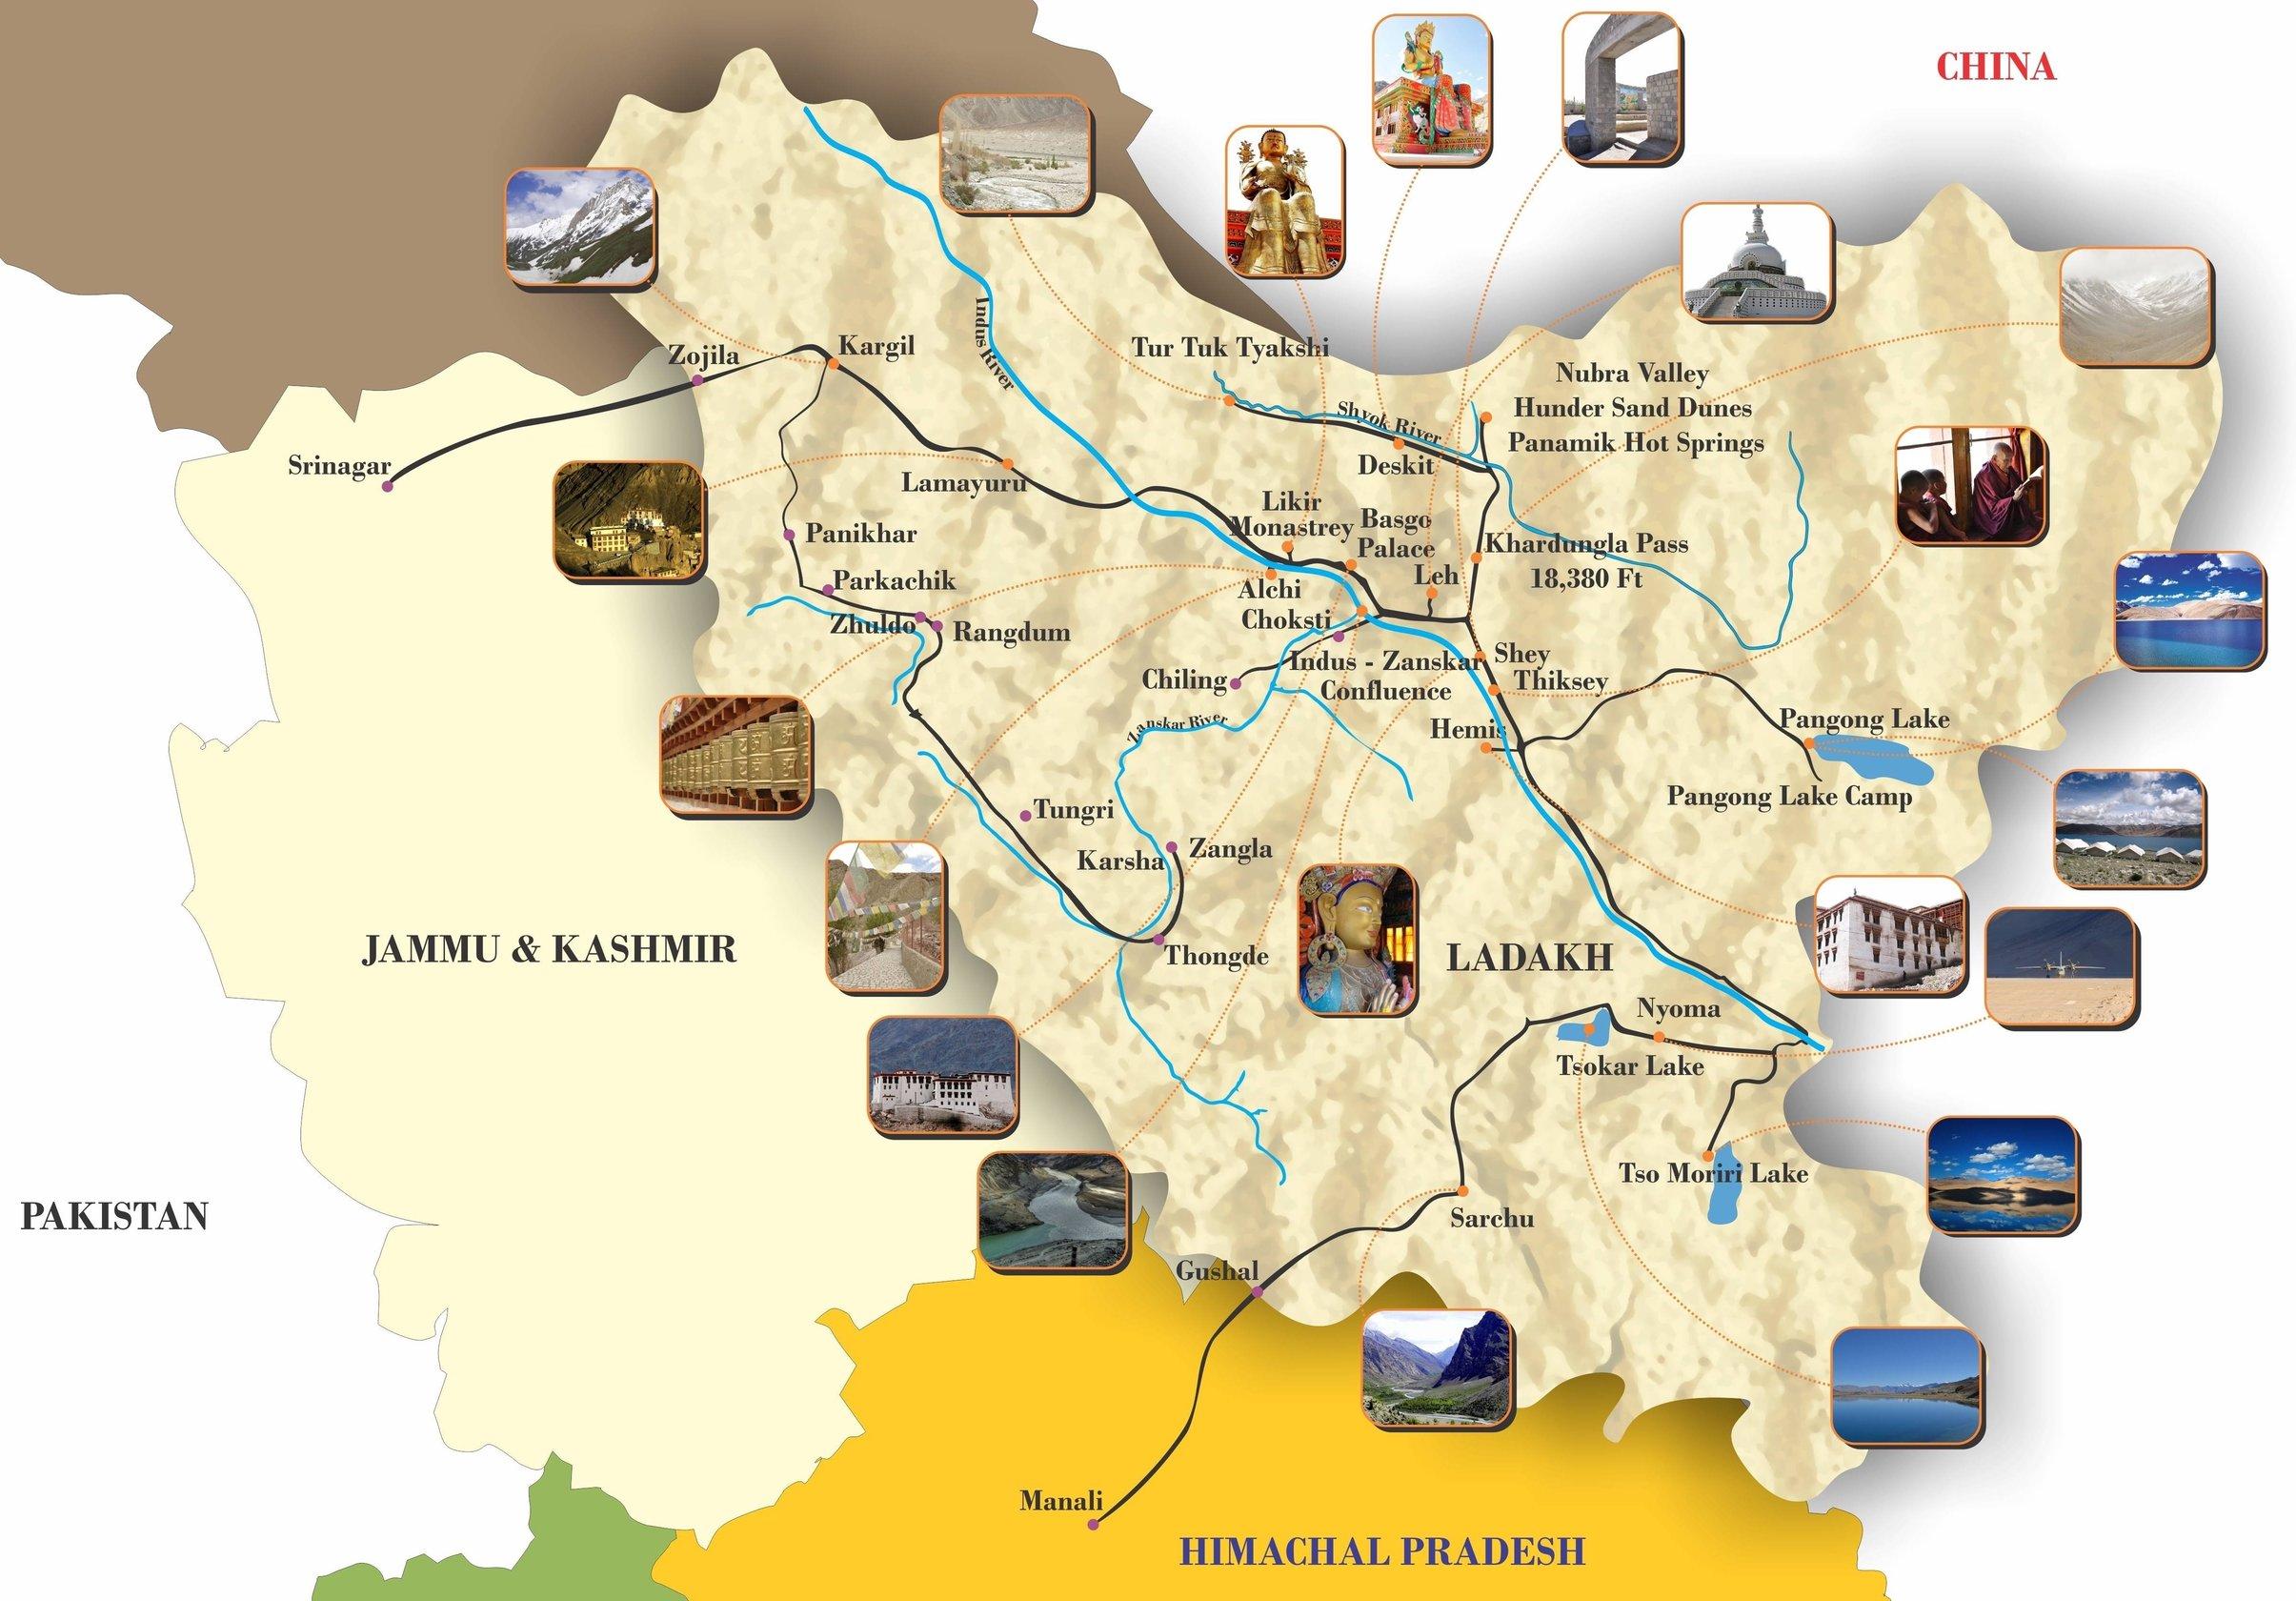 Map Of Ladakh Map of Ladakh, Ladakh Tours Operato, Ladakh Travel Company. Map Of Ladakh